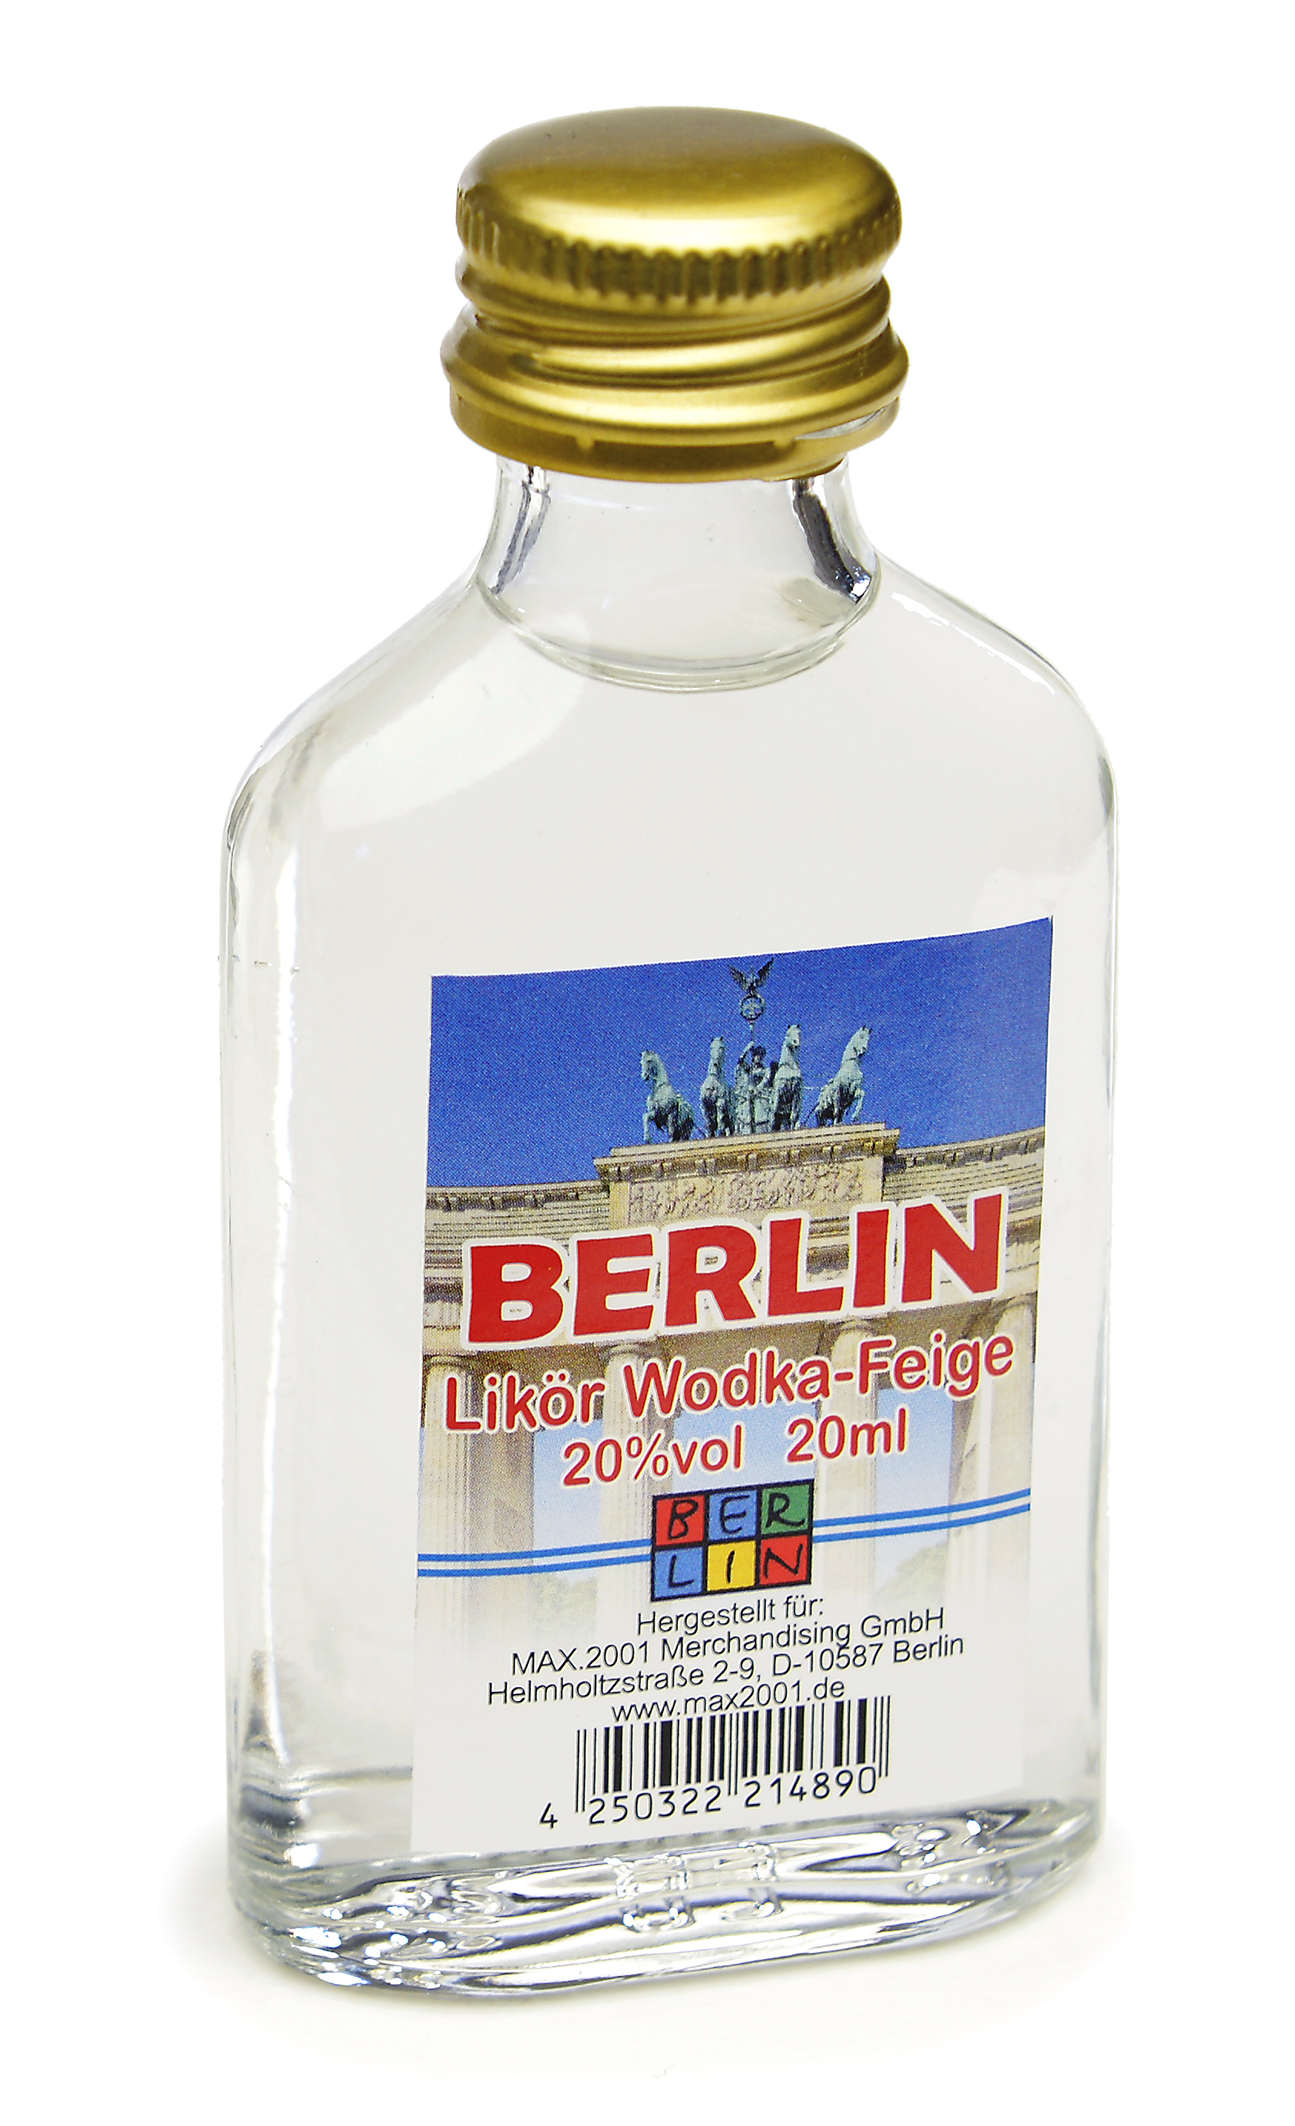 100-6050_Likoer_Wodka-Feige